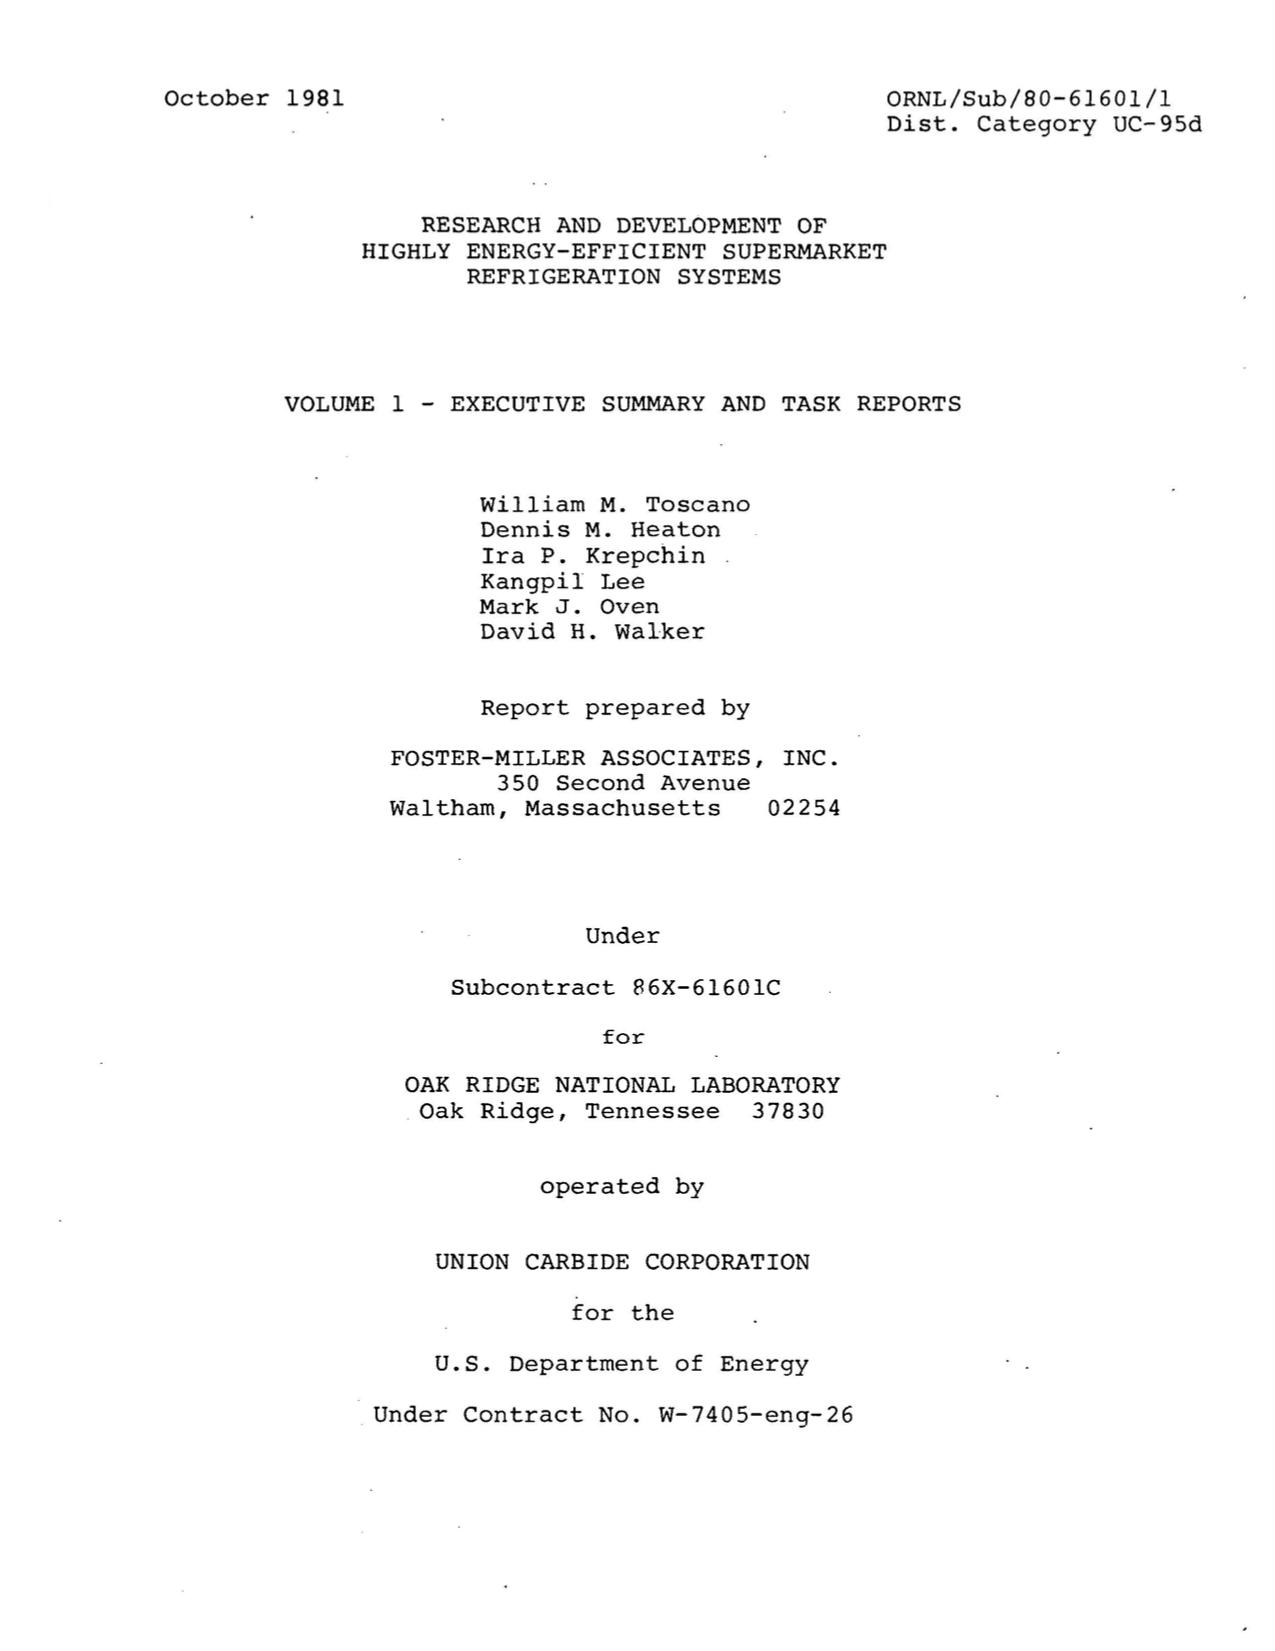 Php Manual Download Pdf Jeppesen private Pilot Handbook